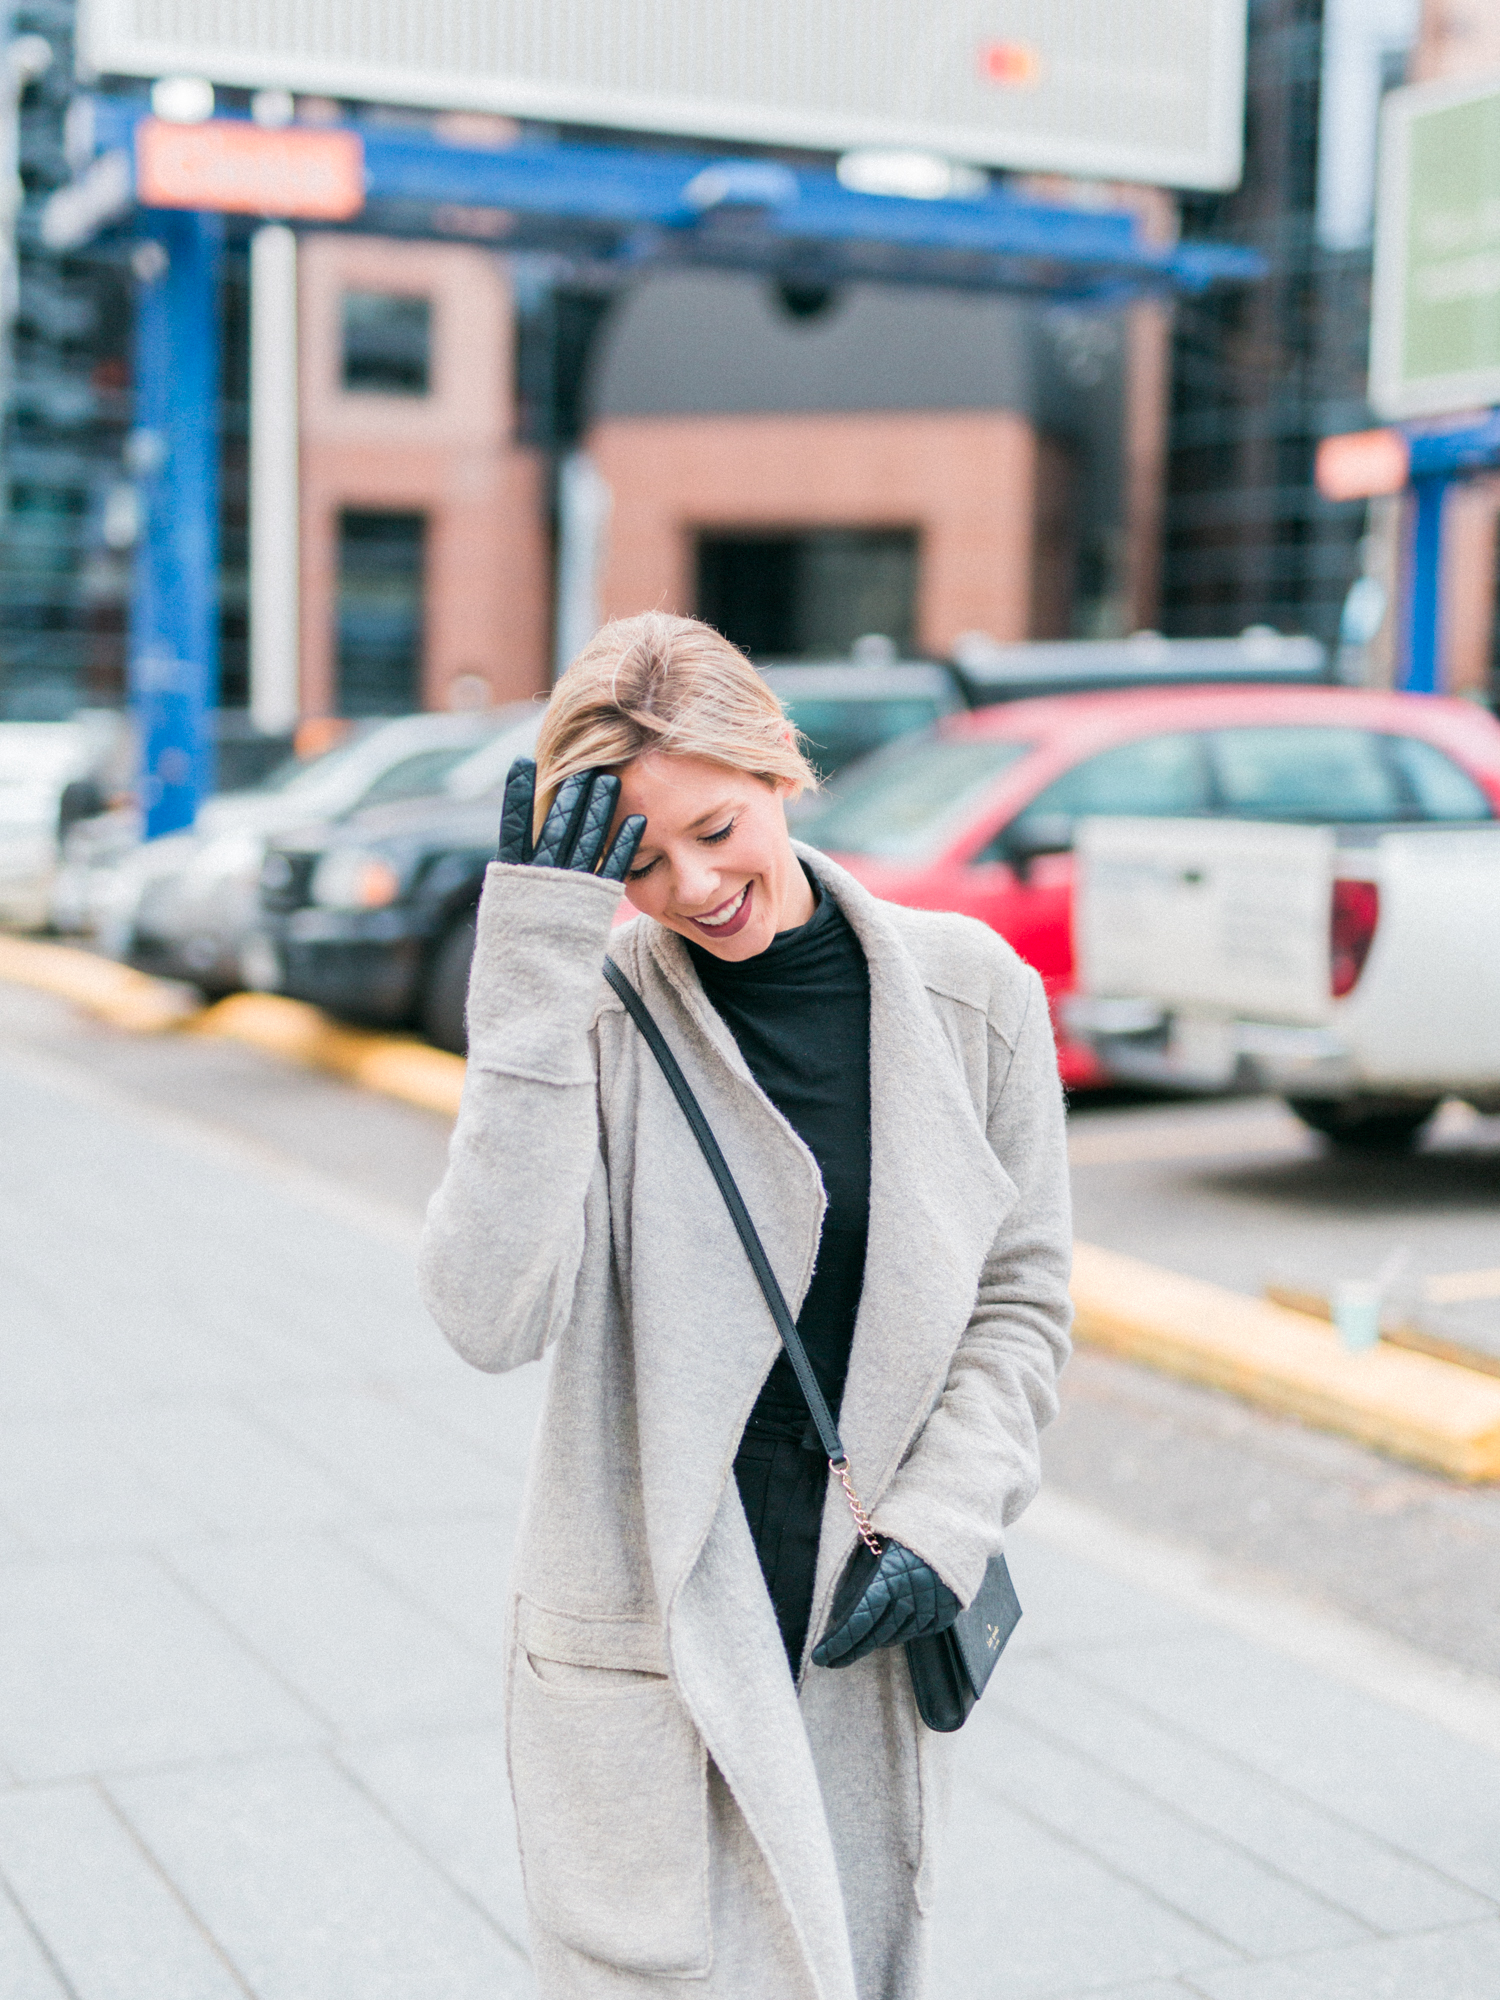 DanielleGirouxPhotography_Toronto_Portrait_StreetPhotography_0C6A1013.jpg